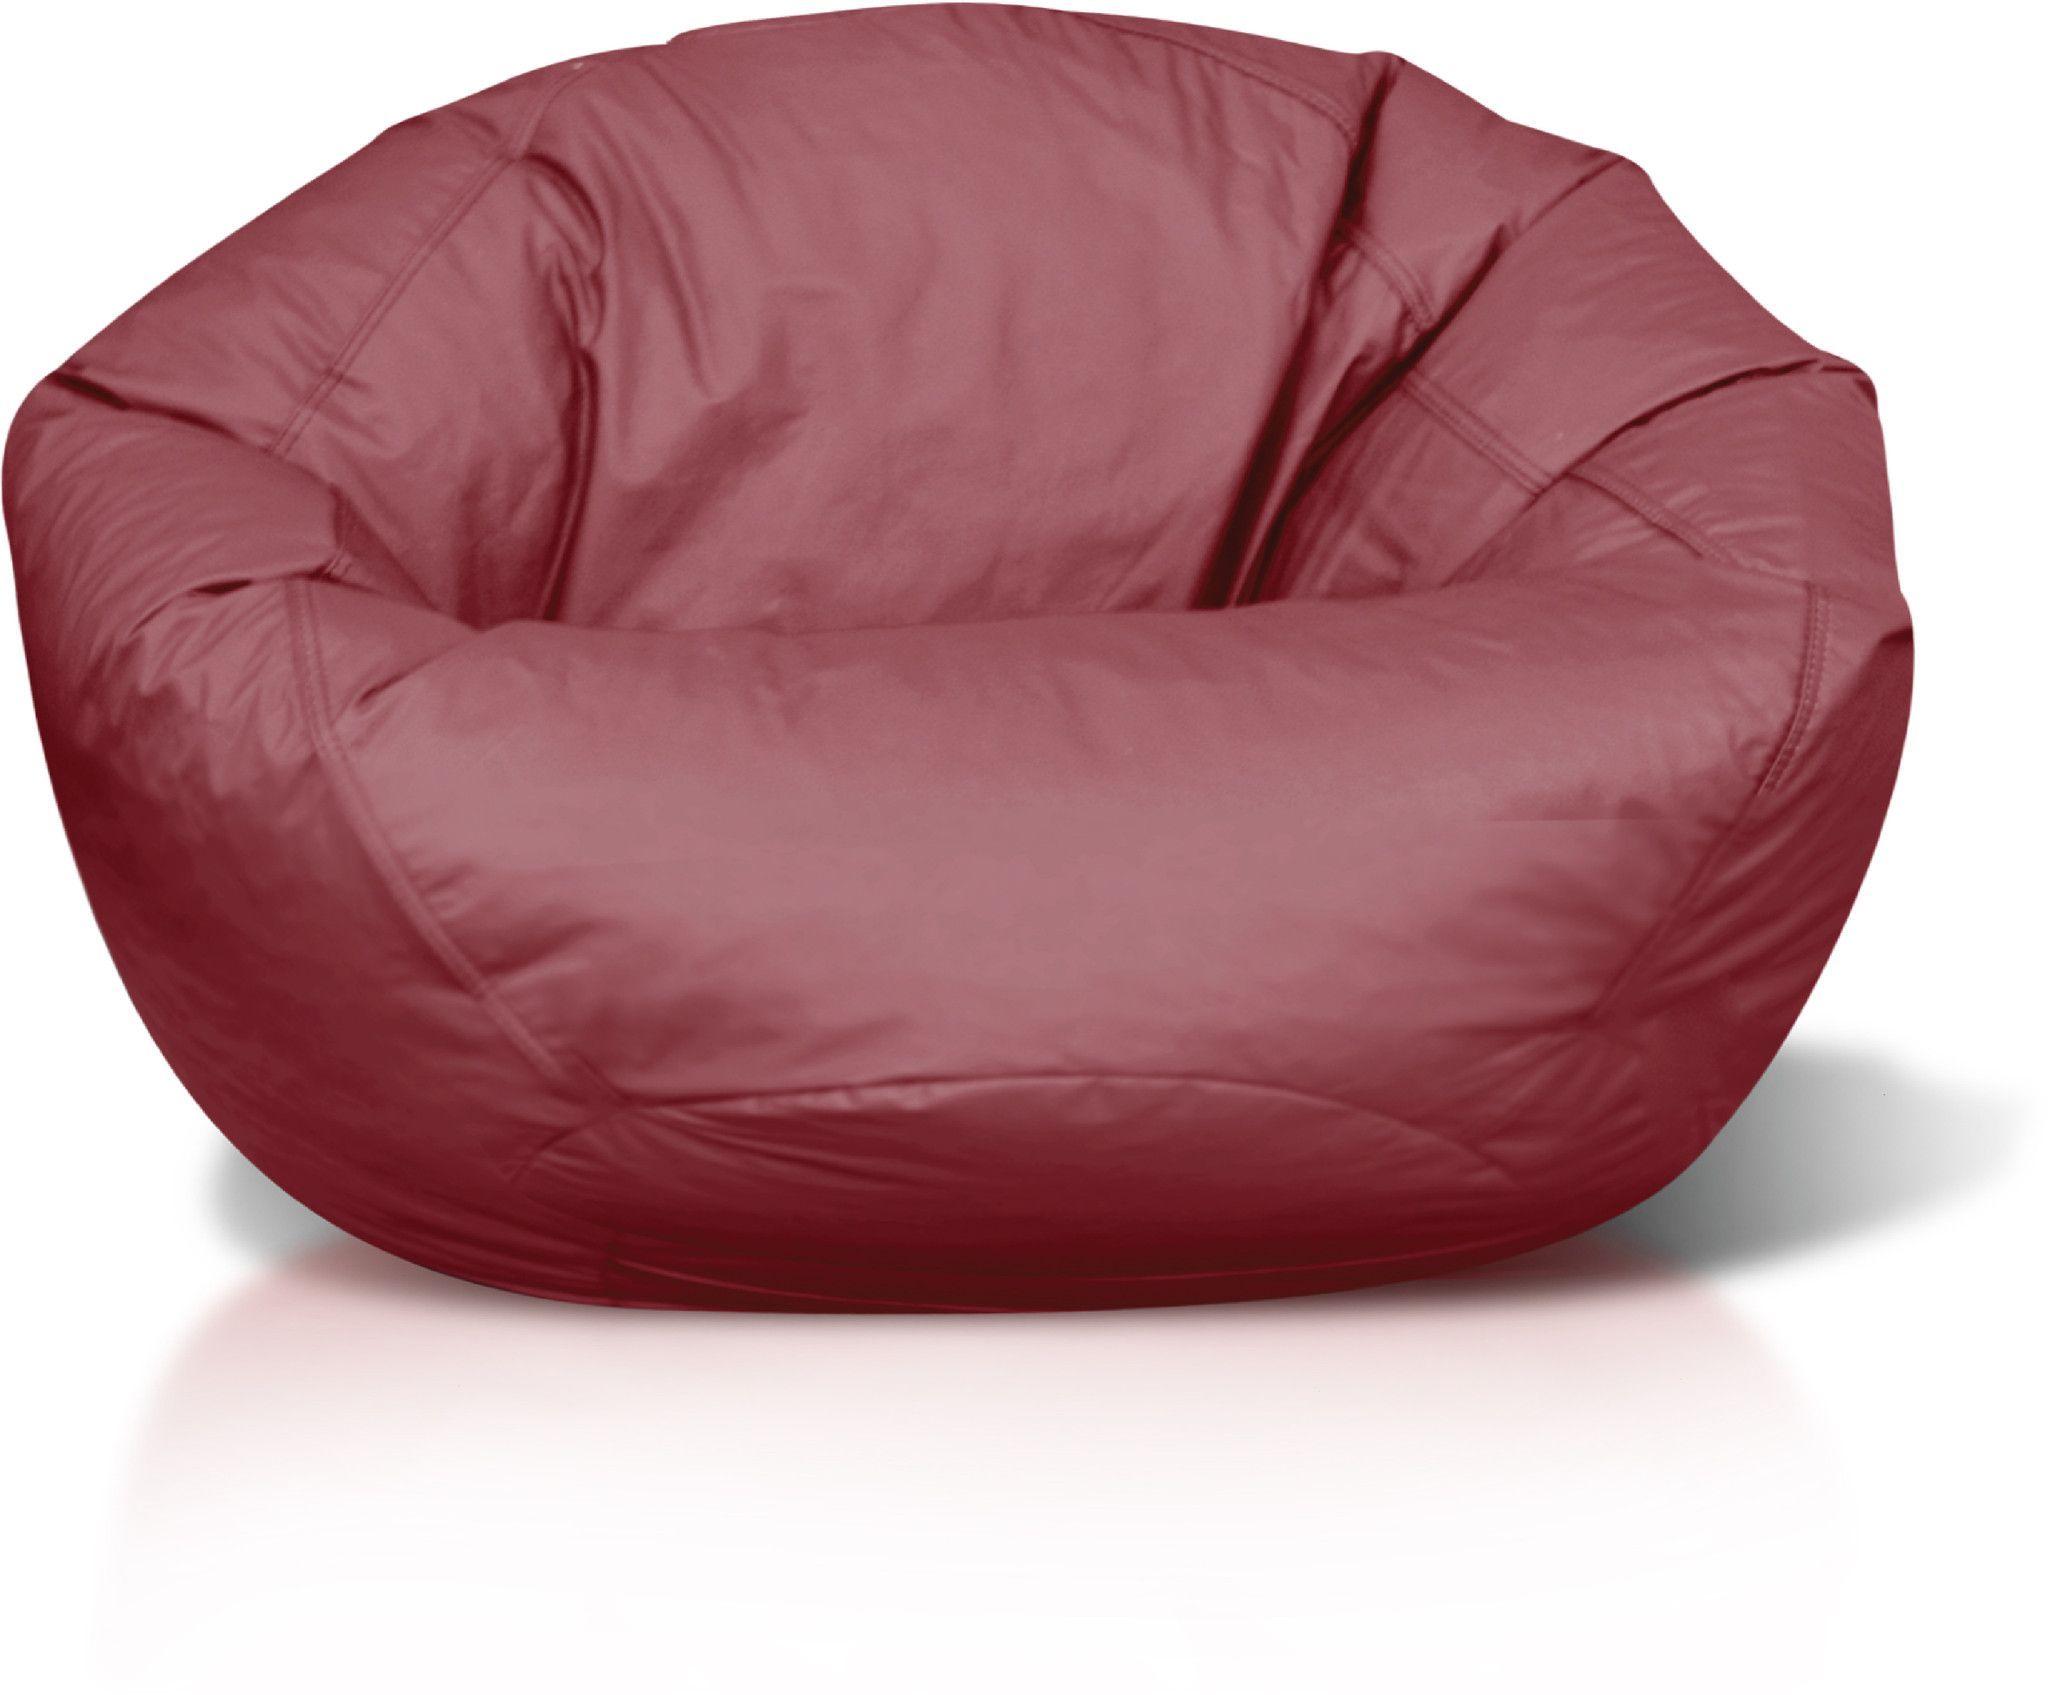 Brilliant Jordan Manufacturing Co Classic Small Bean Bag Burgundy Lamtechconsult Wood Chair Design Ideas Lamtechconsultcom